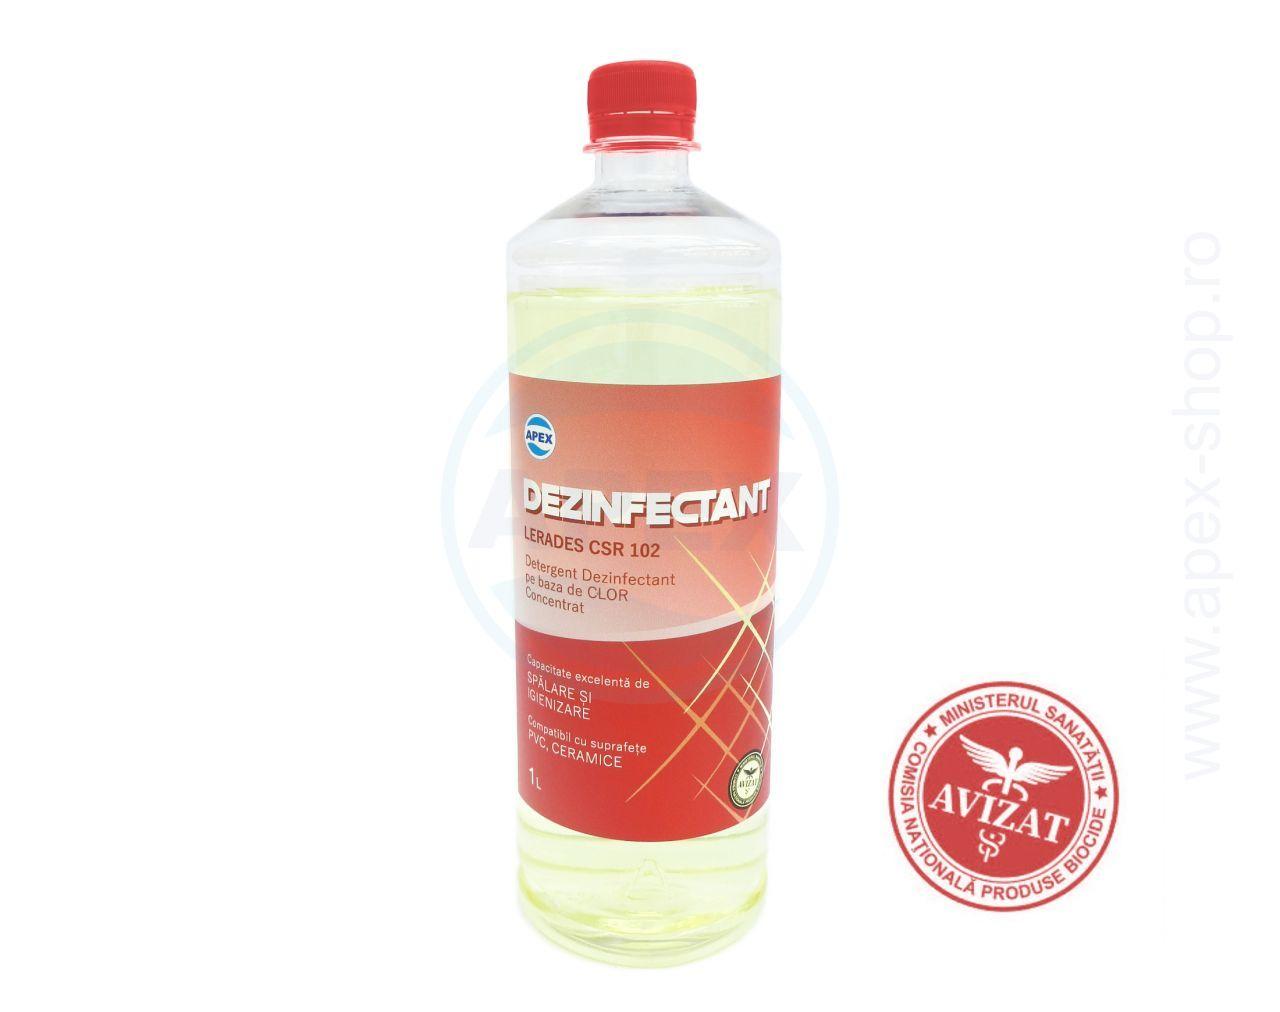 Dezinfectant concentrat pe baza de clor Lerades CSR102